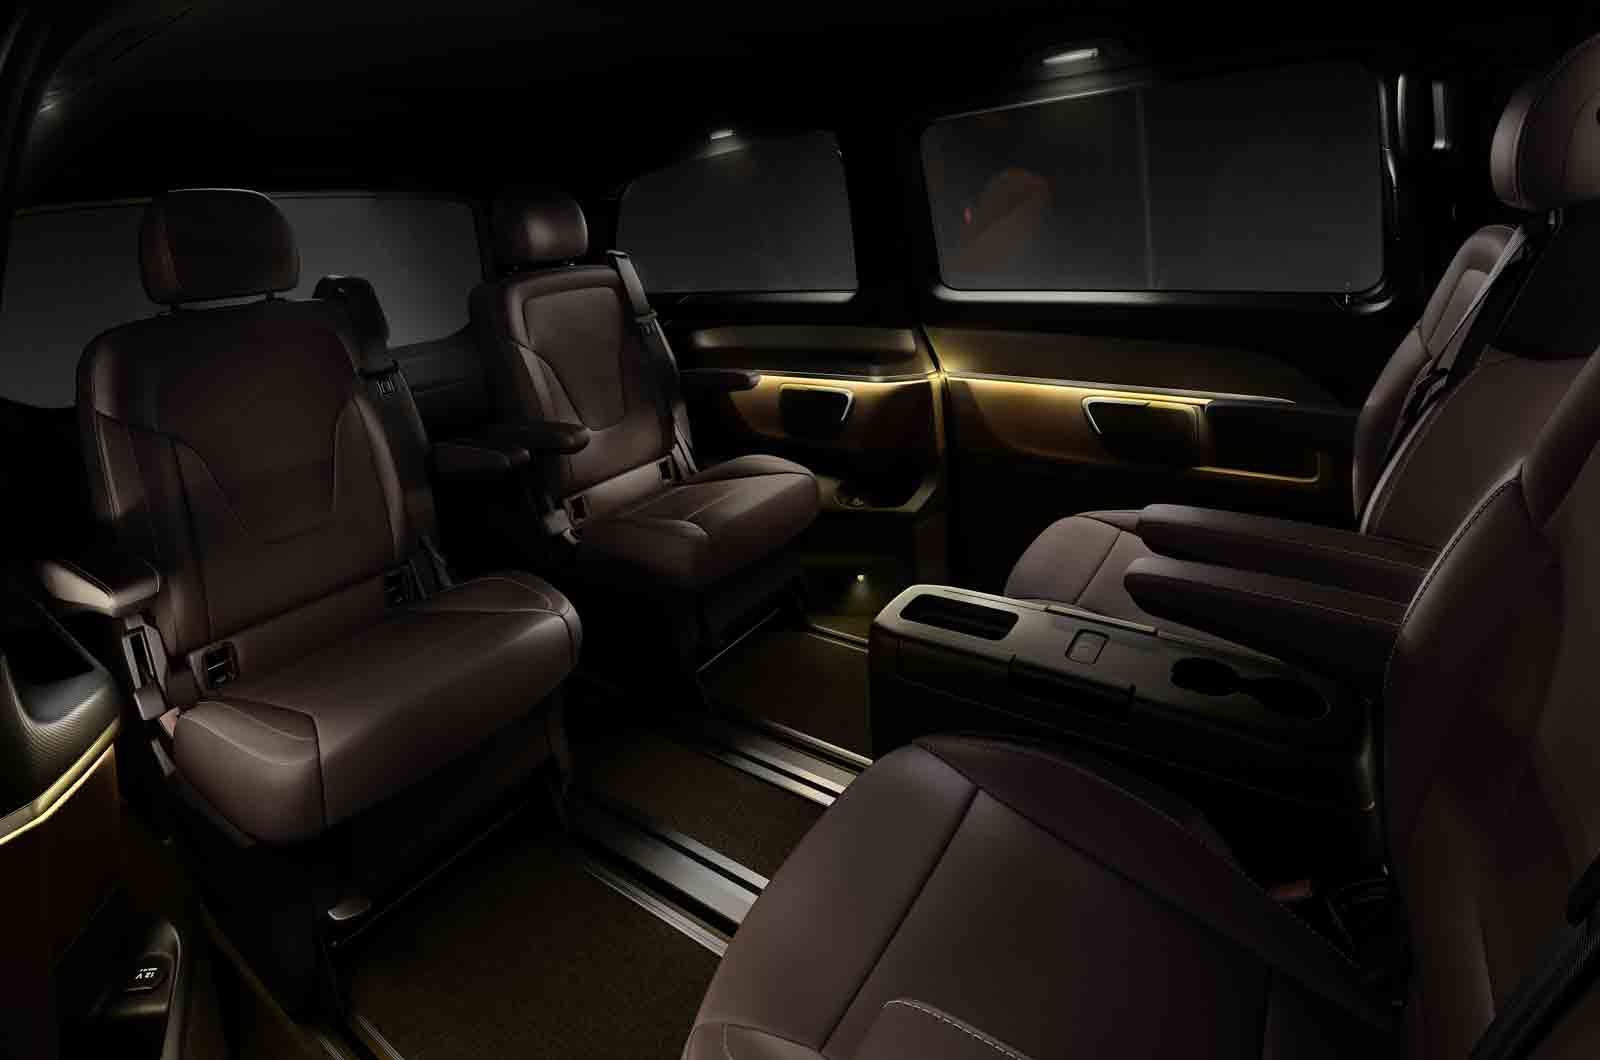 Viano 2014 ... - Page 2 V-class-interior-007